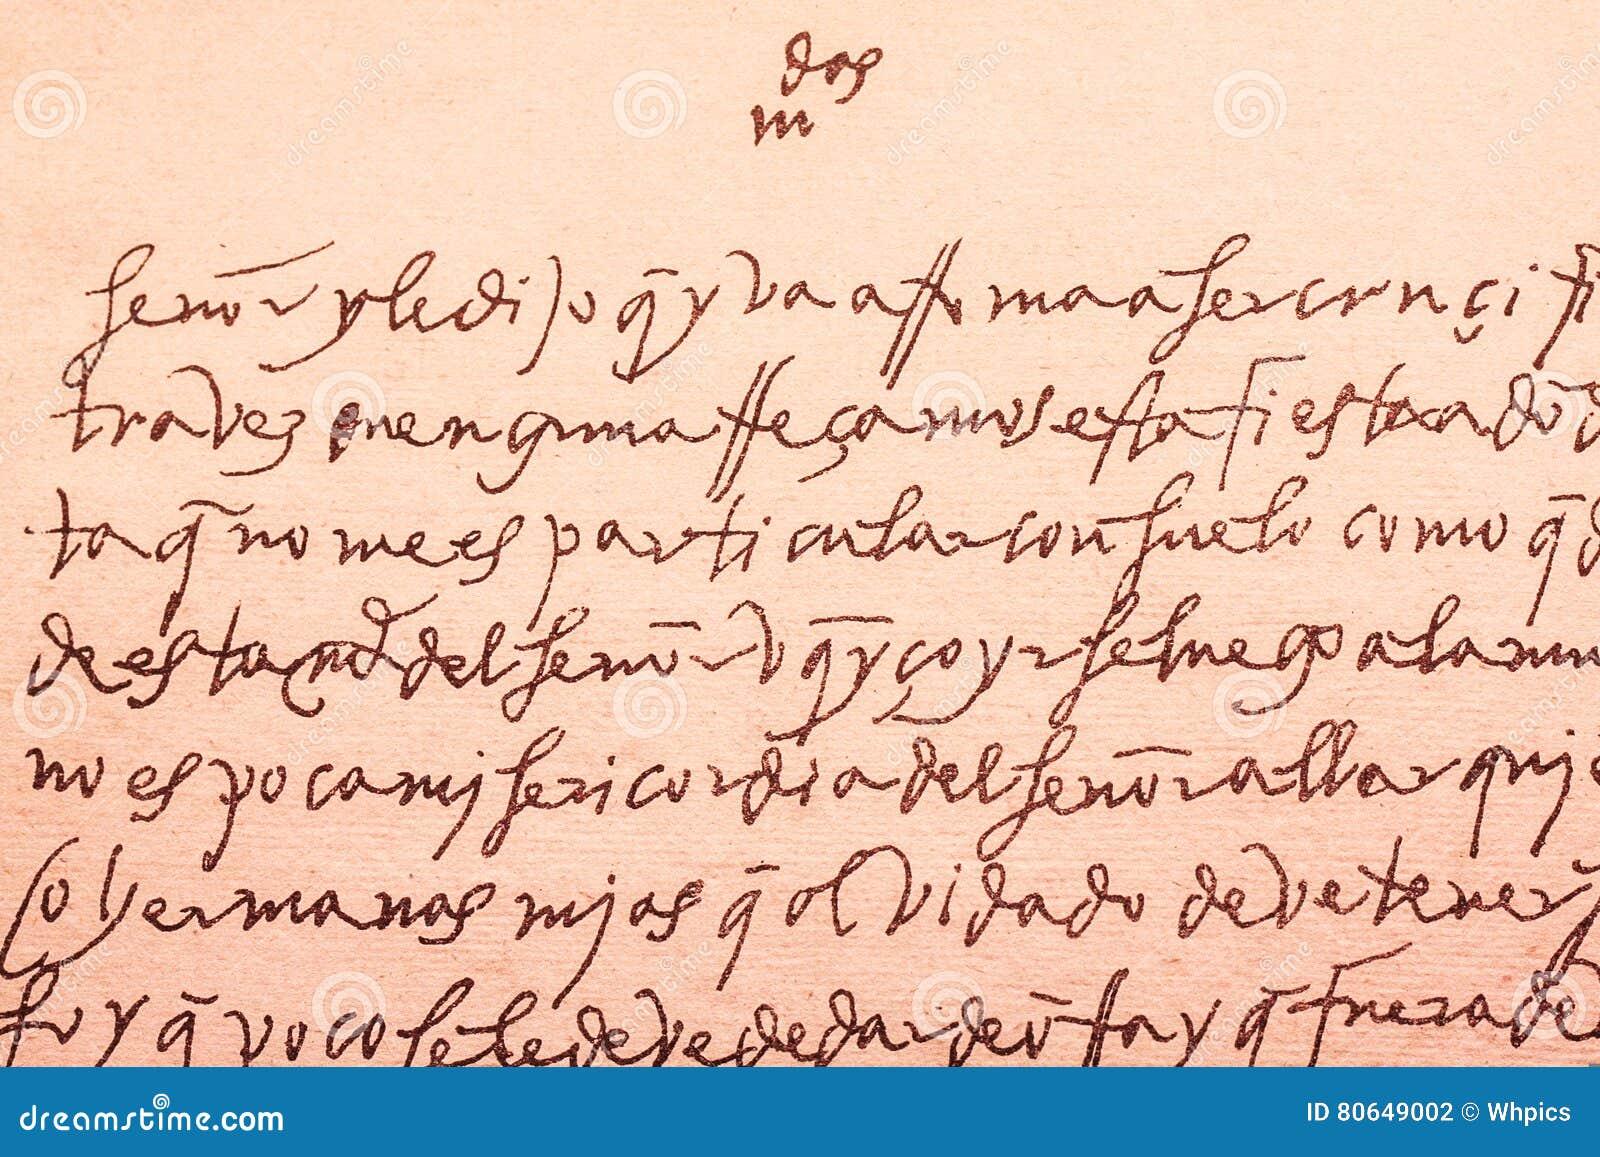 old letter written in spanish from xvi century